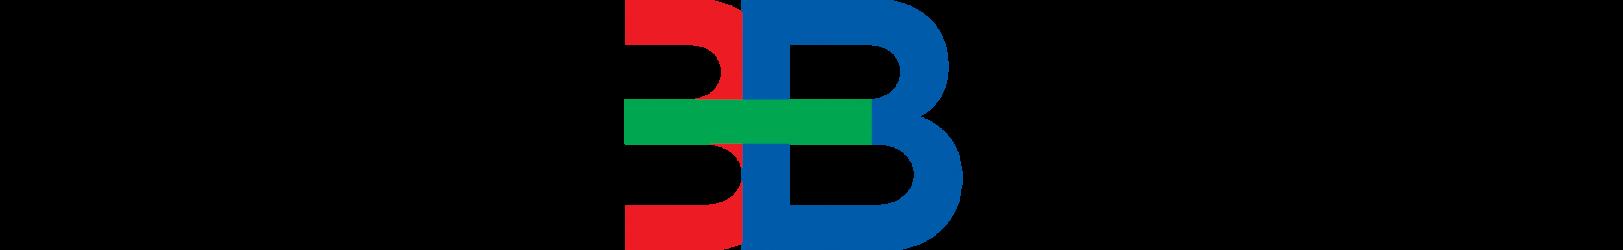 Bruckmeier Brandschutz